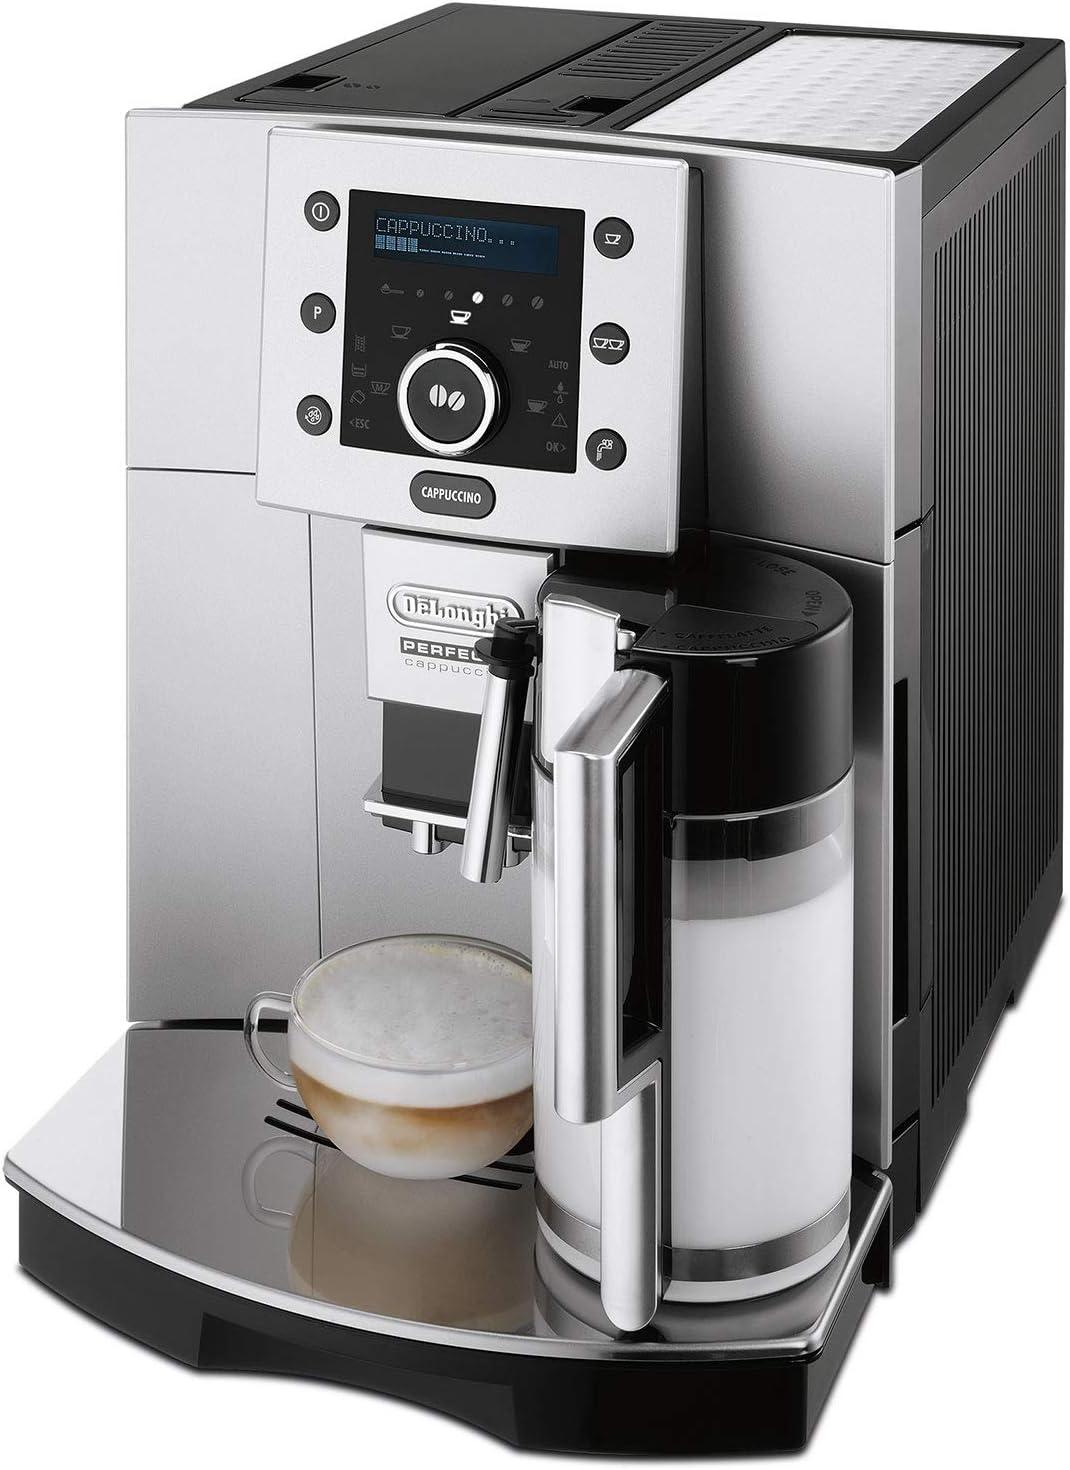 Delonghi ESAM 5500.M Máquina De Espresso Automática, 1350 W, 1.8 Litros, Acero Inoxidable, Gris